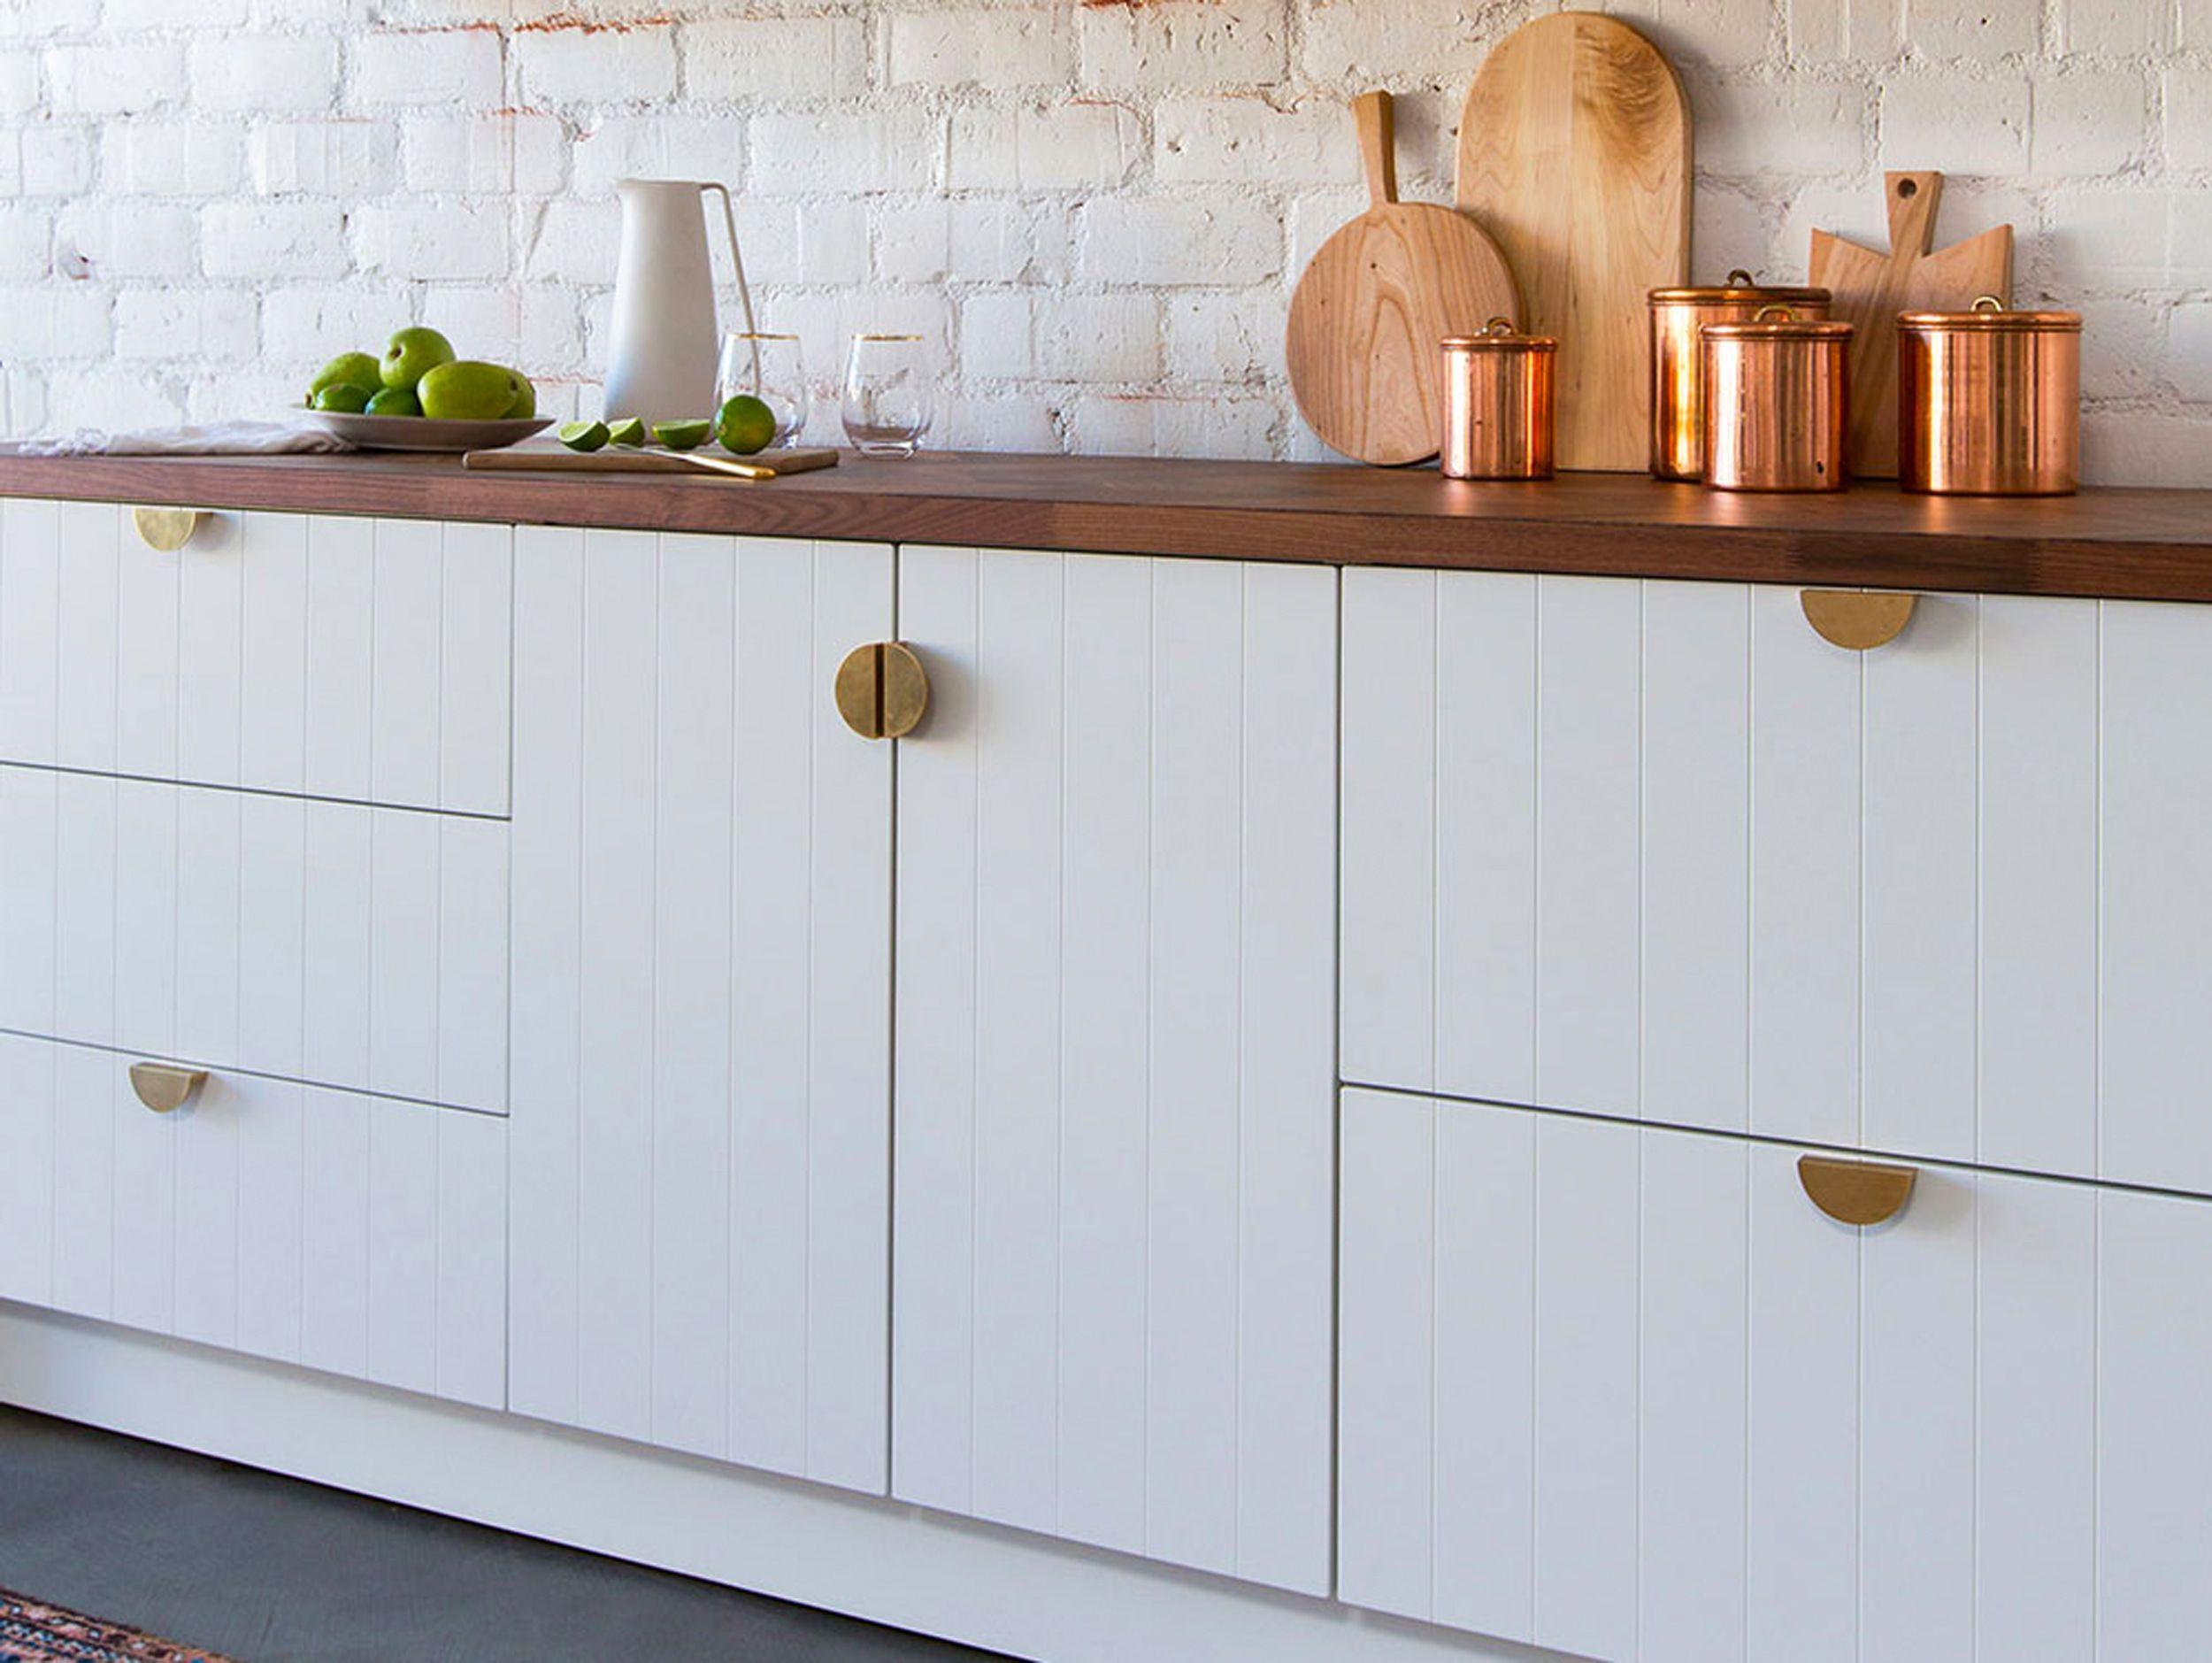 Emily Henderson Mountain House Kitchen Evolution Inspo Sss